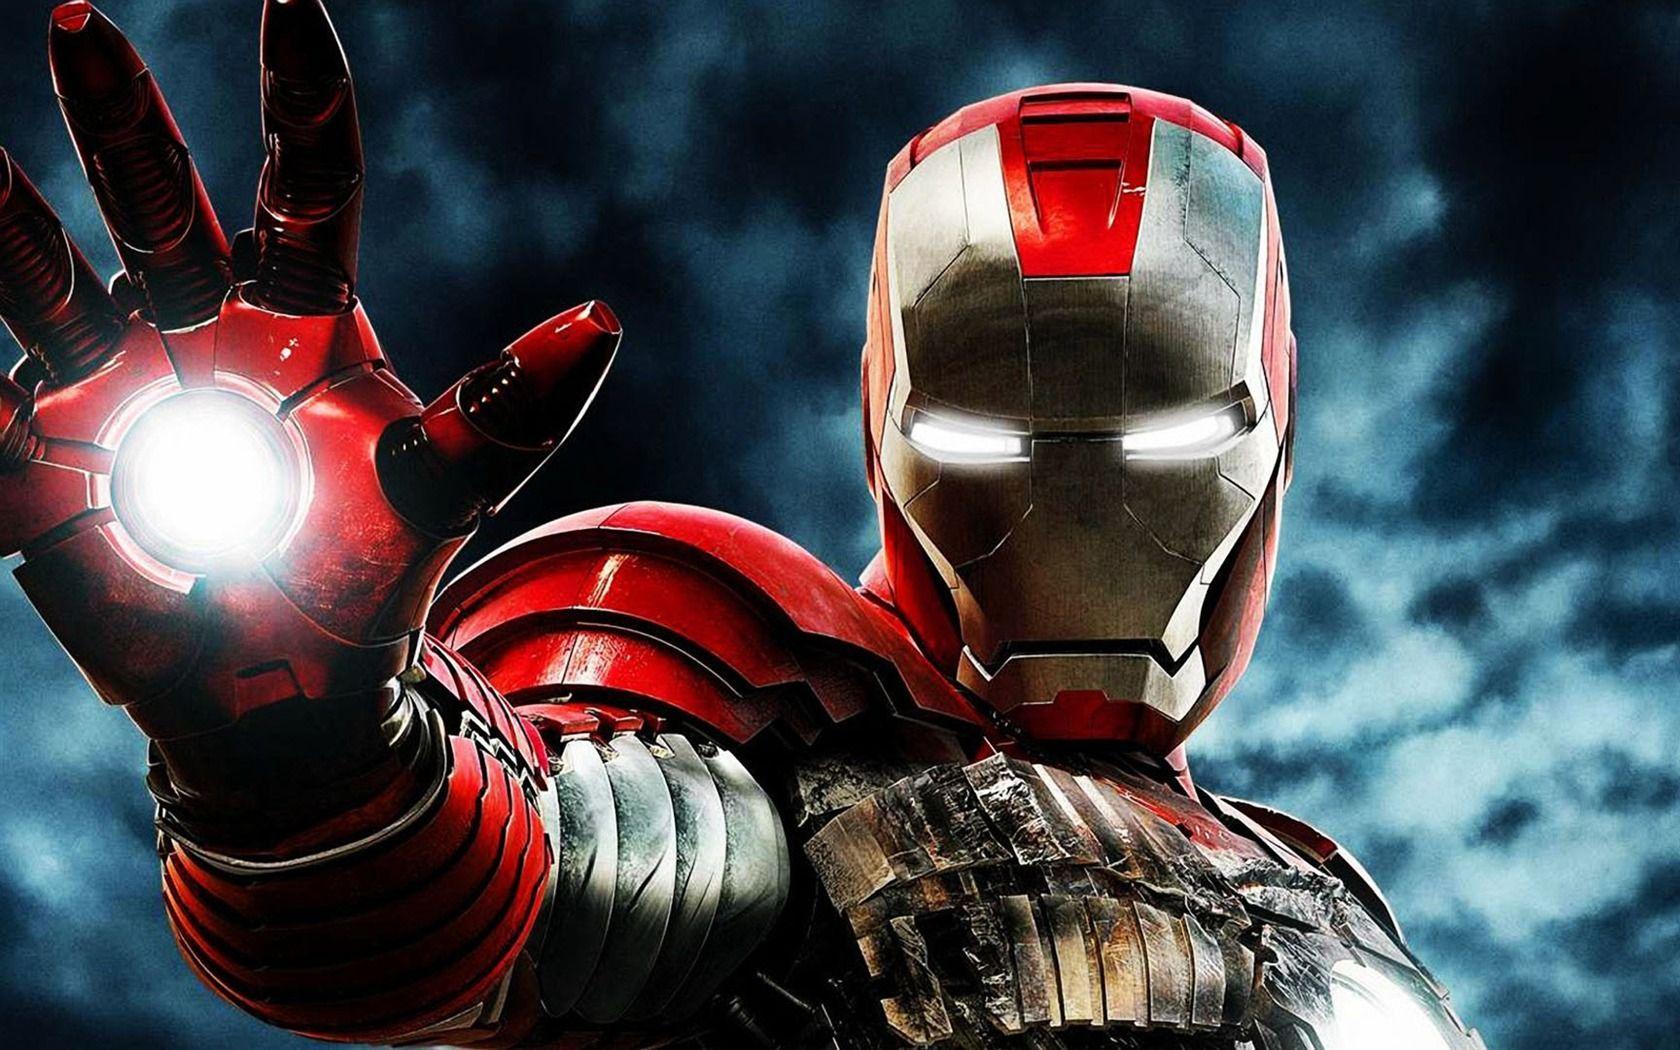 Iron-man-3-HD-wallpaper - wallpaper.wiki